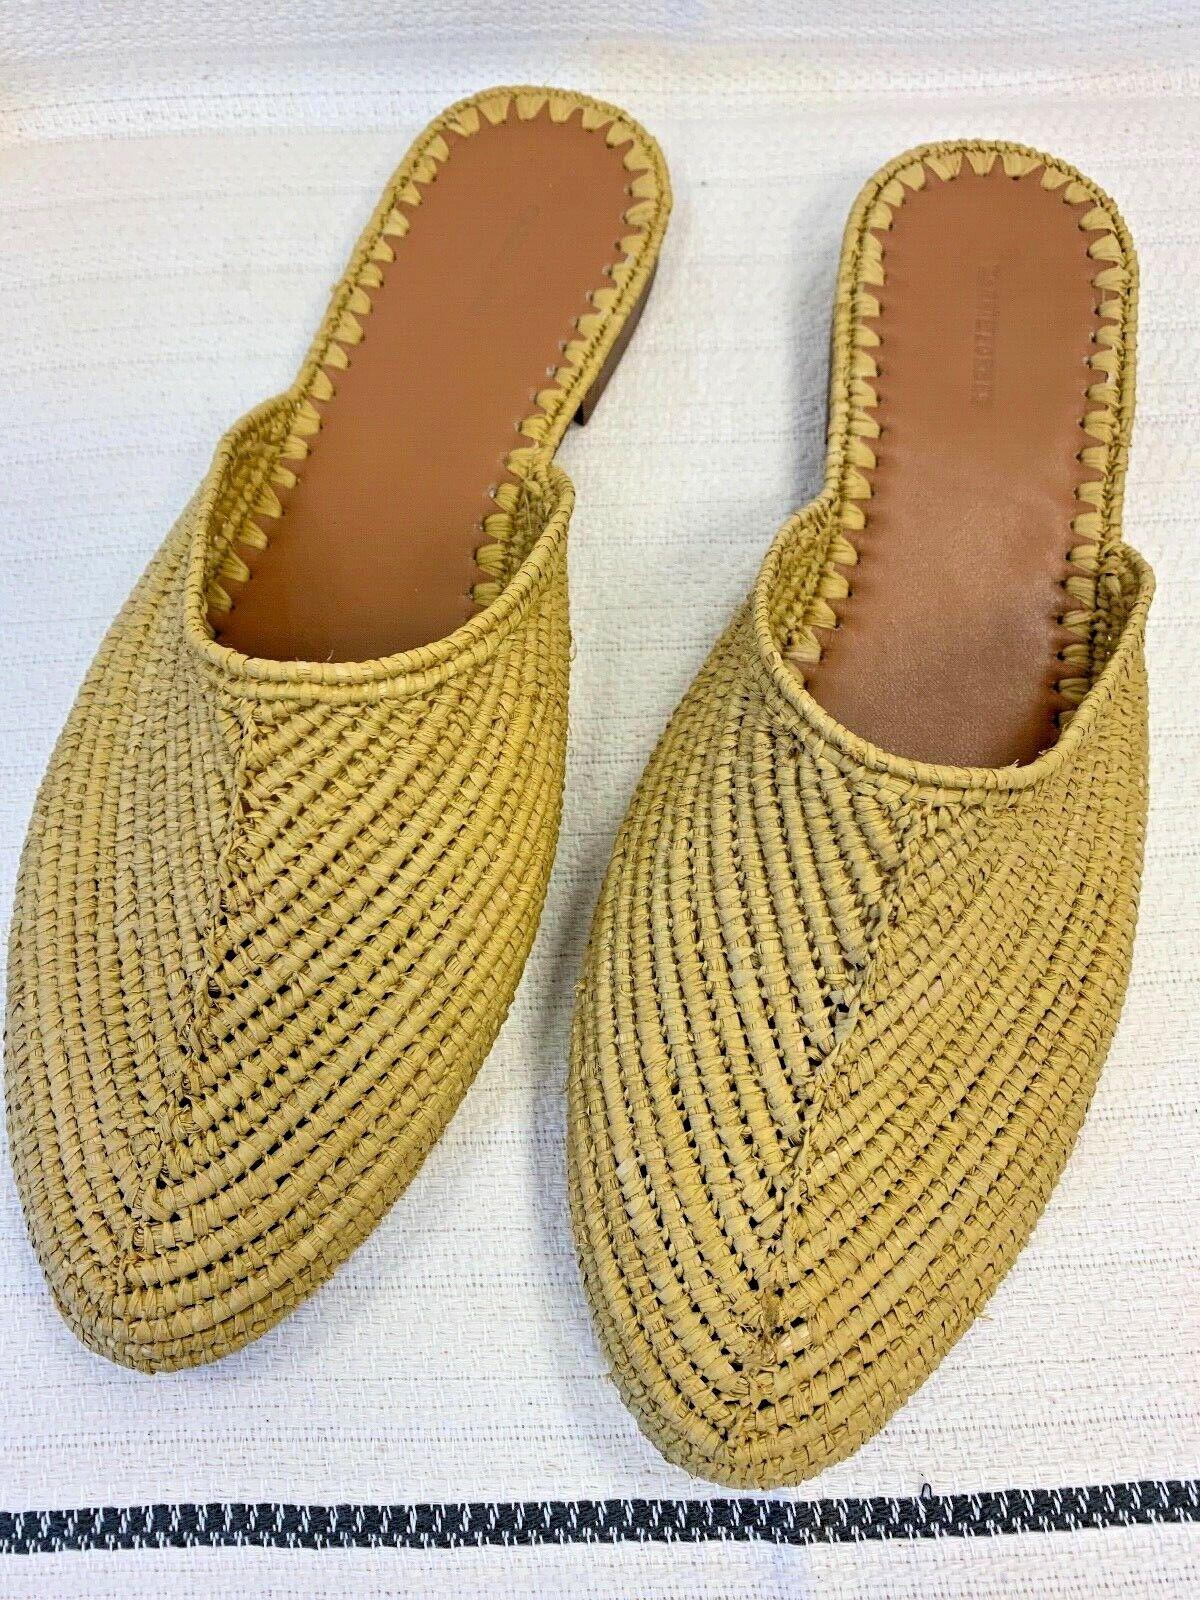 Carrie Forbes Mimi Woven Raffia Slide Sandals, NIB, Mustard, Größe 41 (US 9.5)